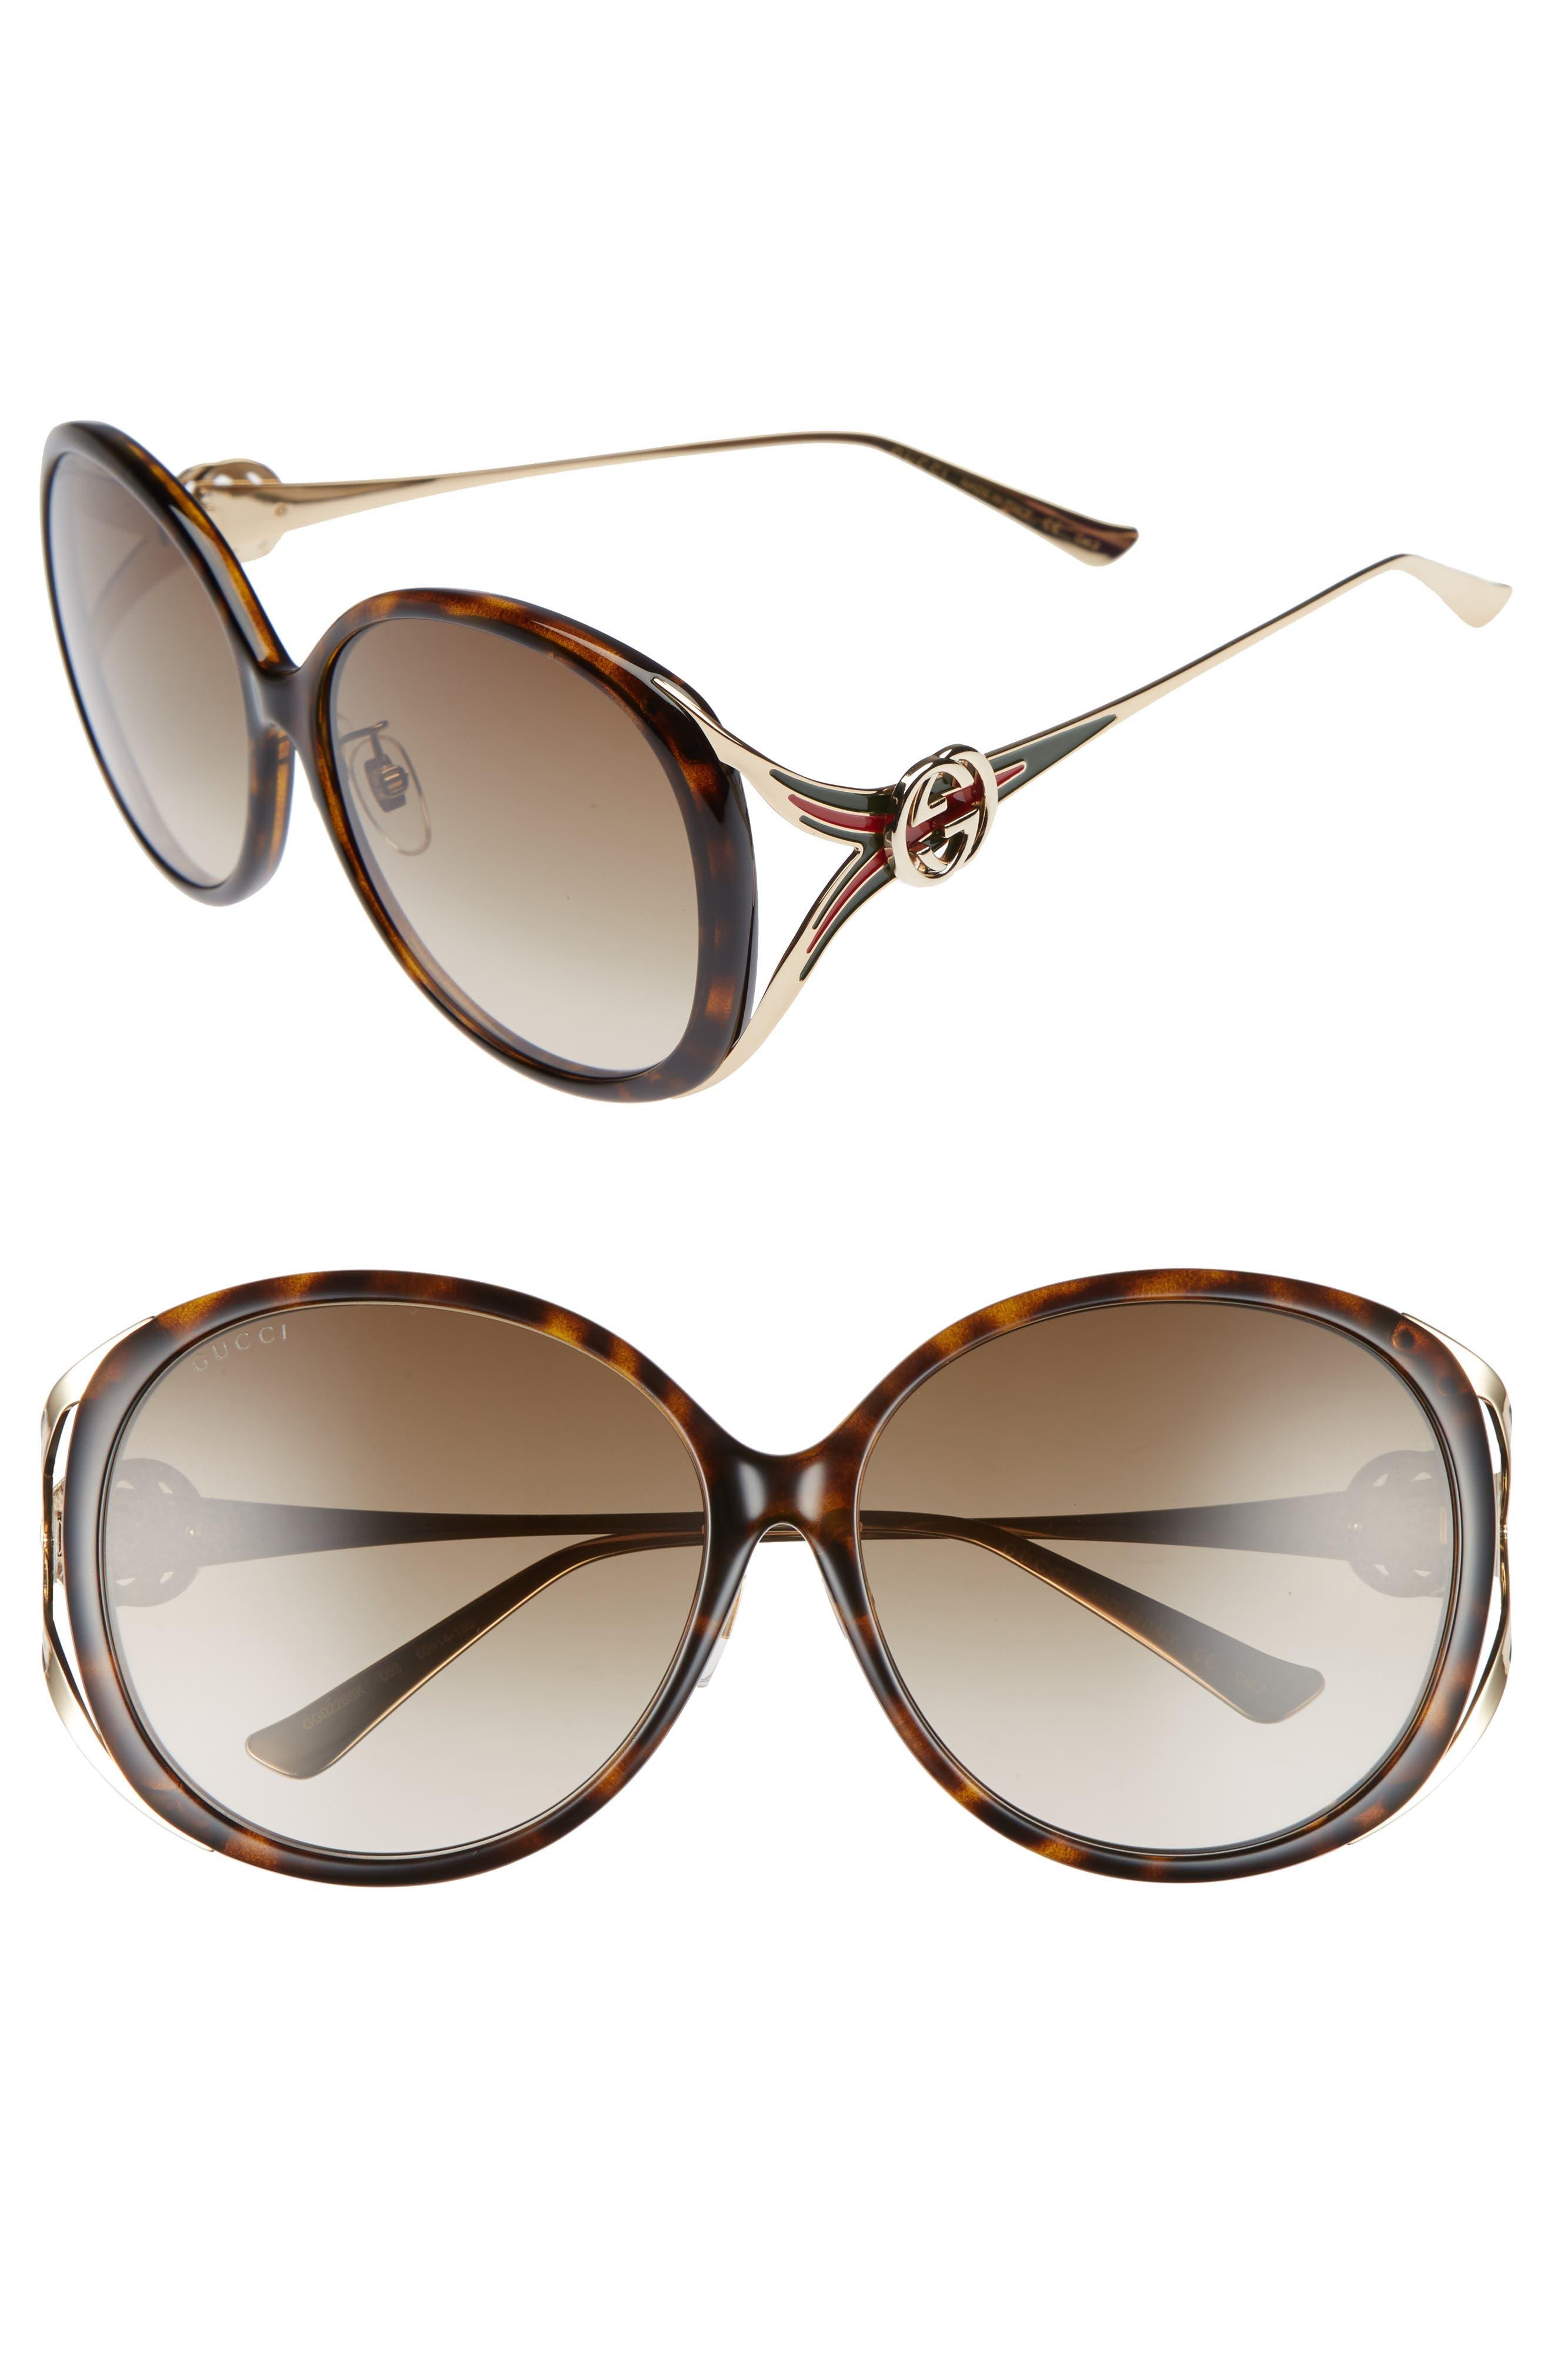 60mm Round Sunglasses,                         Main,                         color, HAVANA